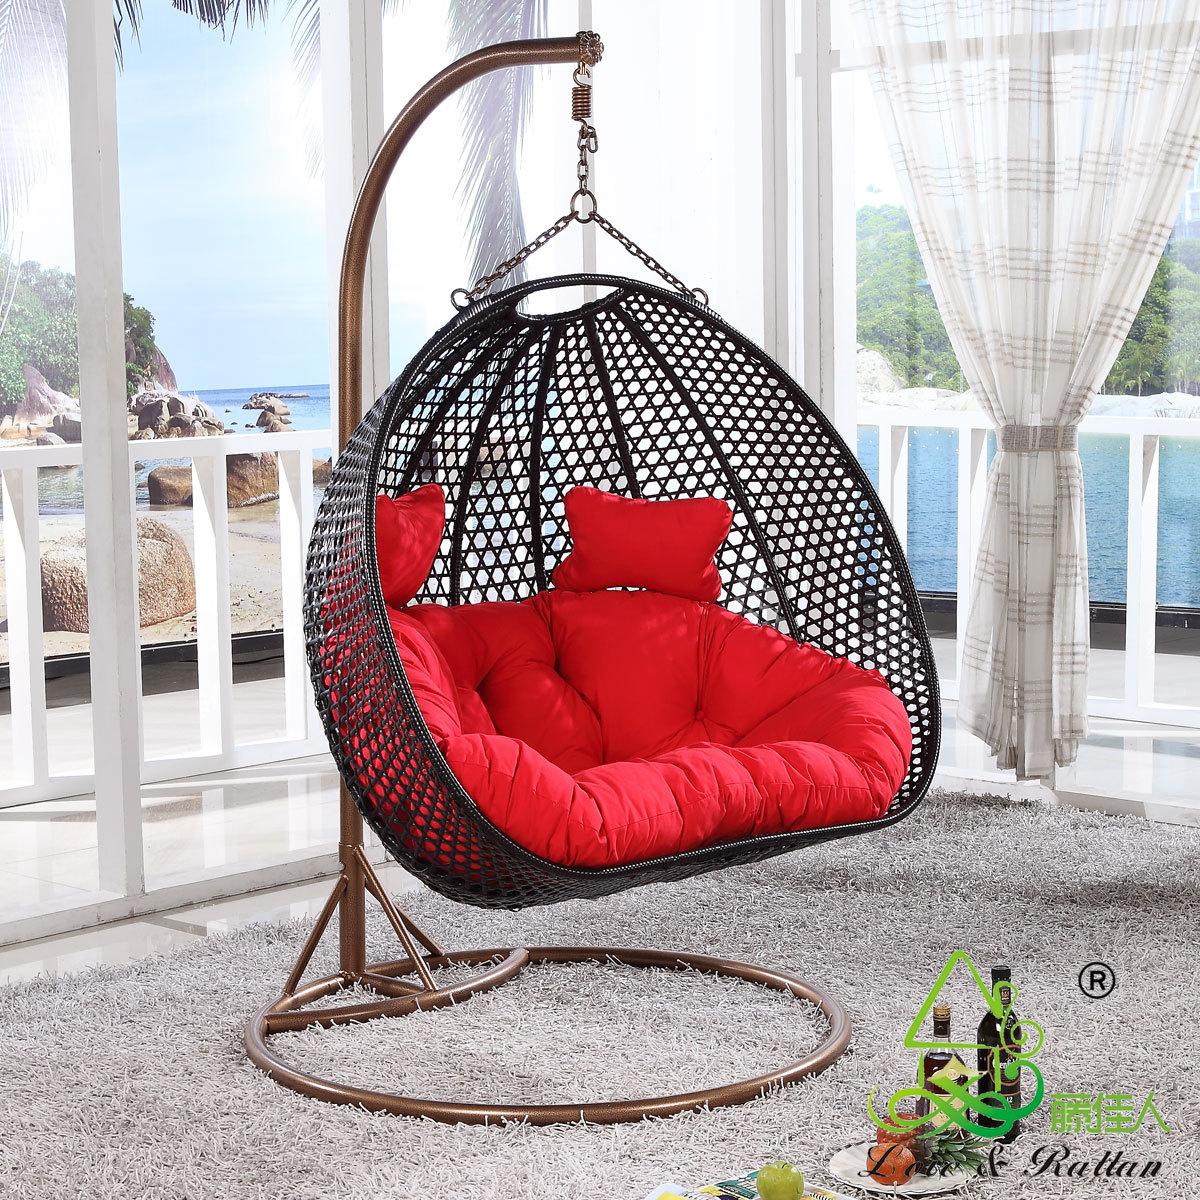 Outdoor Chair Cushions Ebay Australia picture on rattan chair hanging chair rattan hanging basket double swing indoor  with Outdoor Chair Cushions Ebay Australia, sofa 67103de68002c9a1b0726b384d1214e0